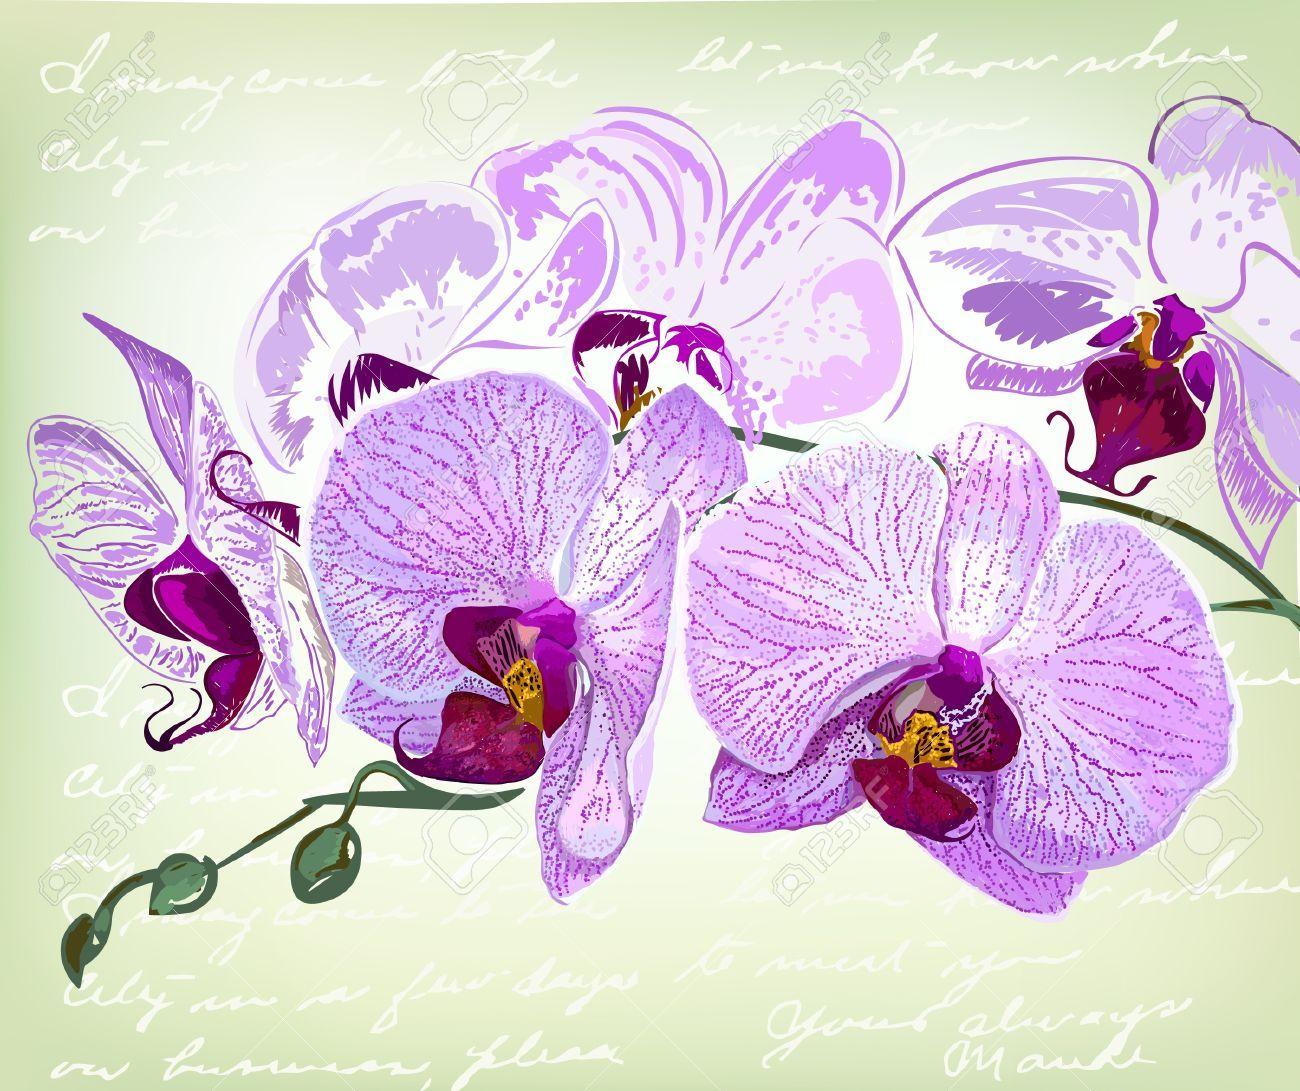 Beau dessin fleur de la main orchid e clip art libres de droits orchid es pinterest - Dessin d orchidee ...